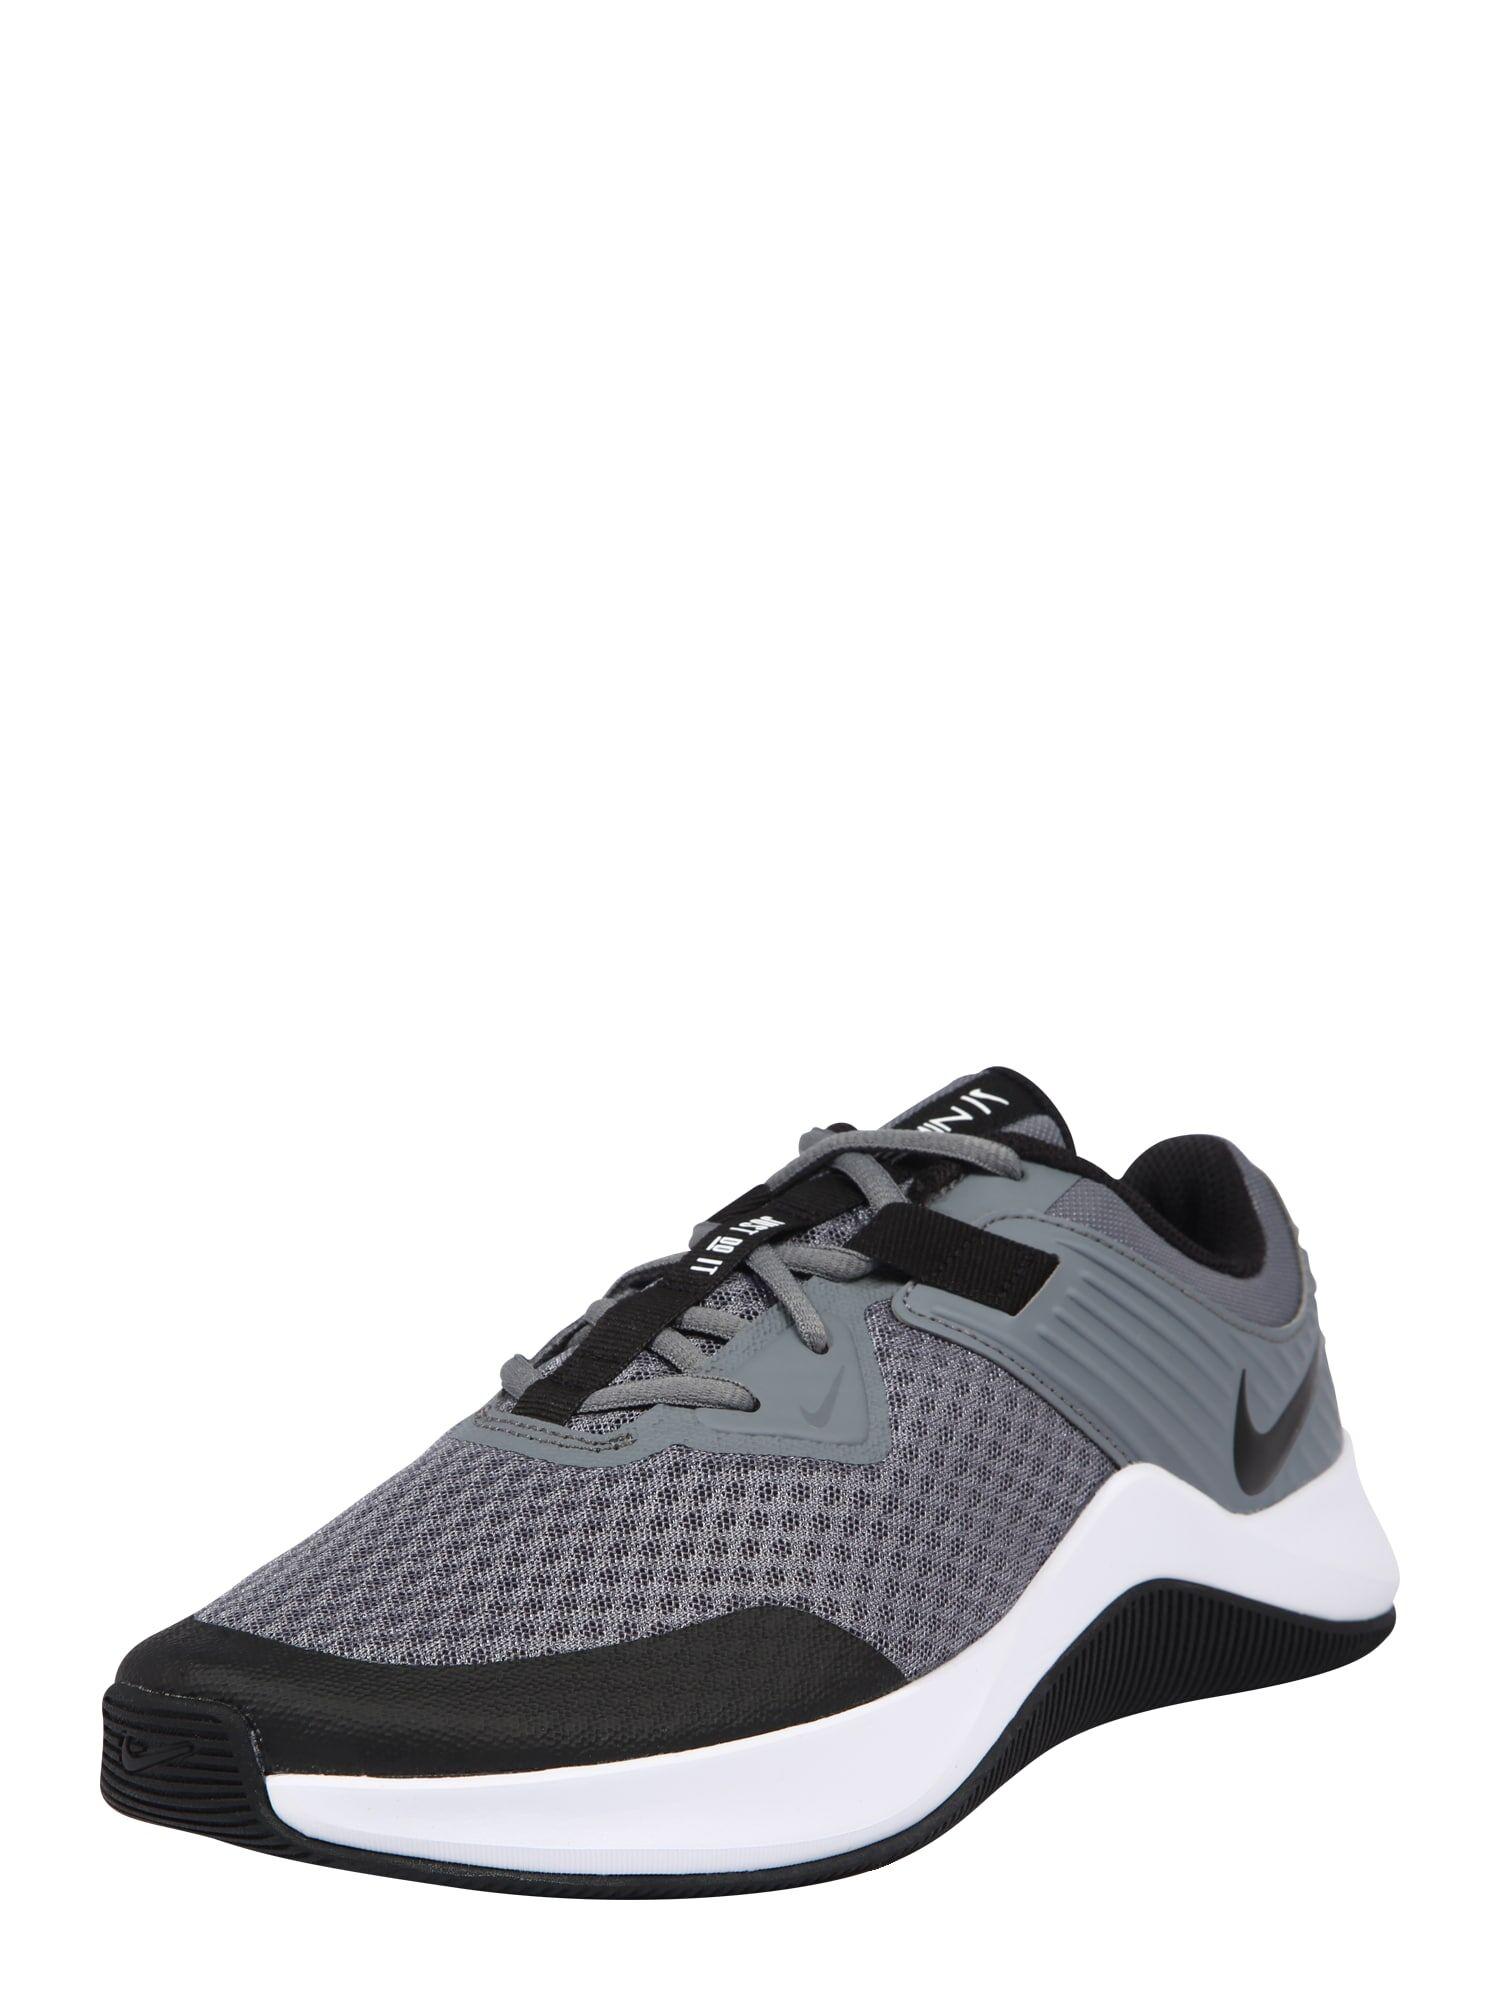 NIKE Chaussure de sport 'MC Trainer'  - Gris - Taille: 10.5 - male